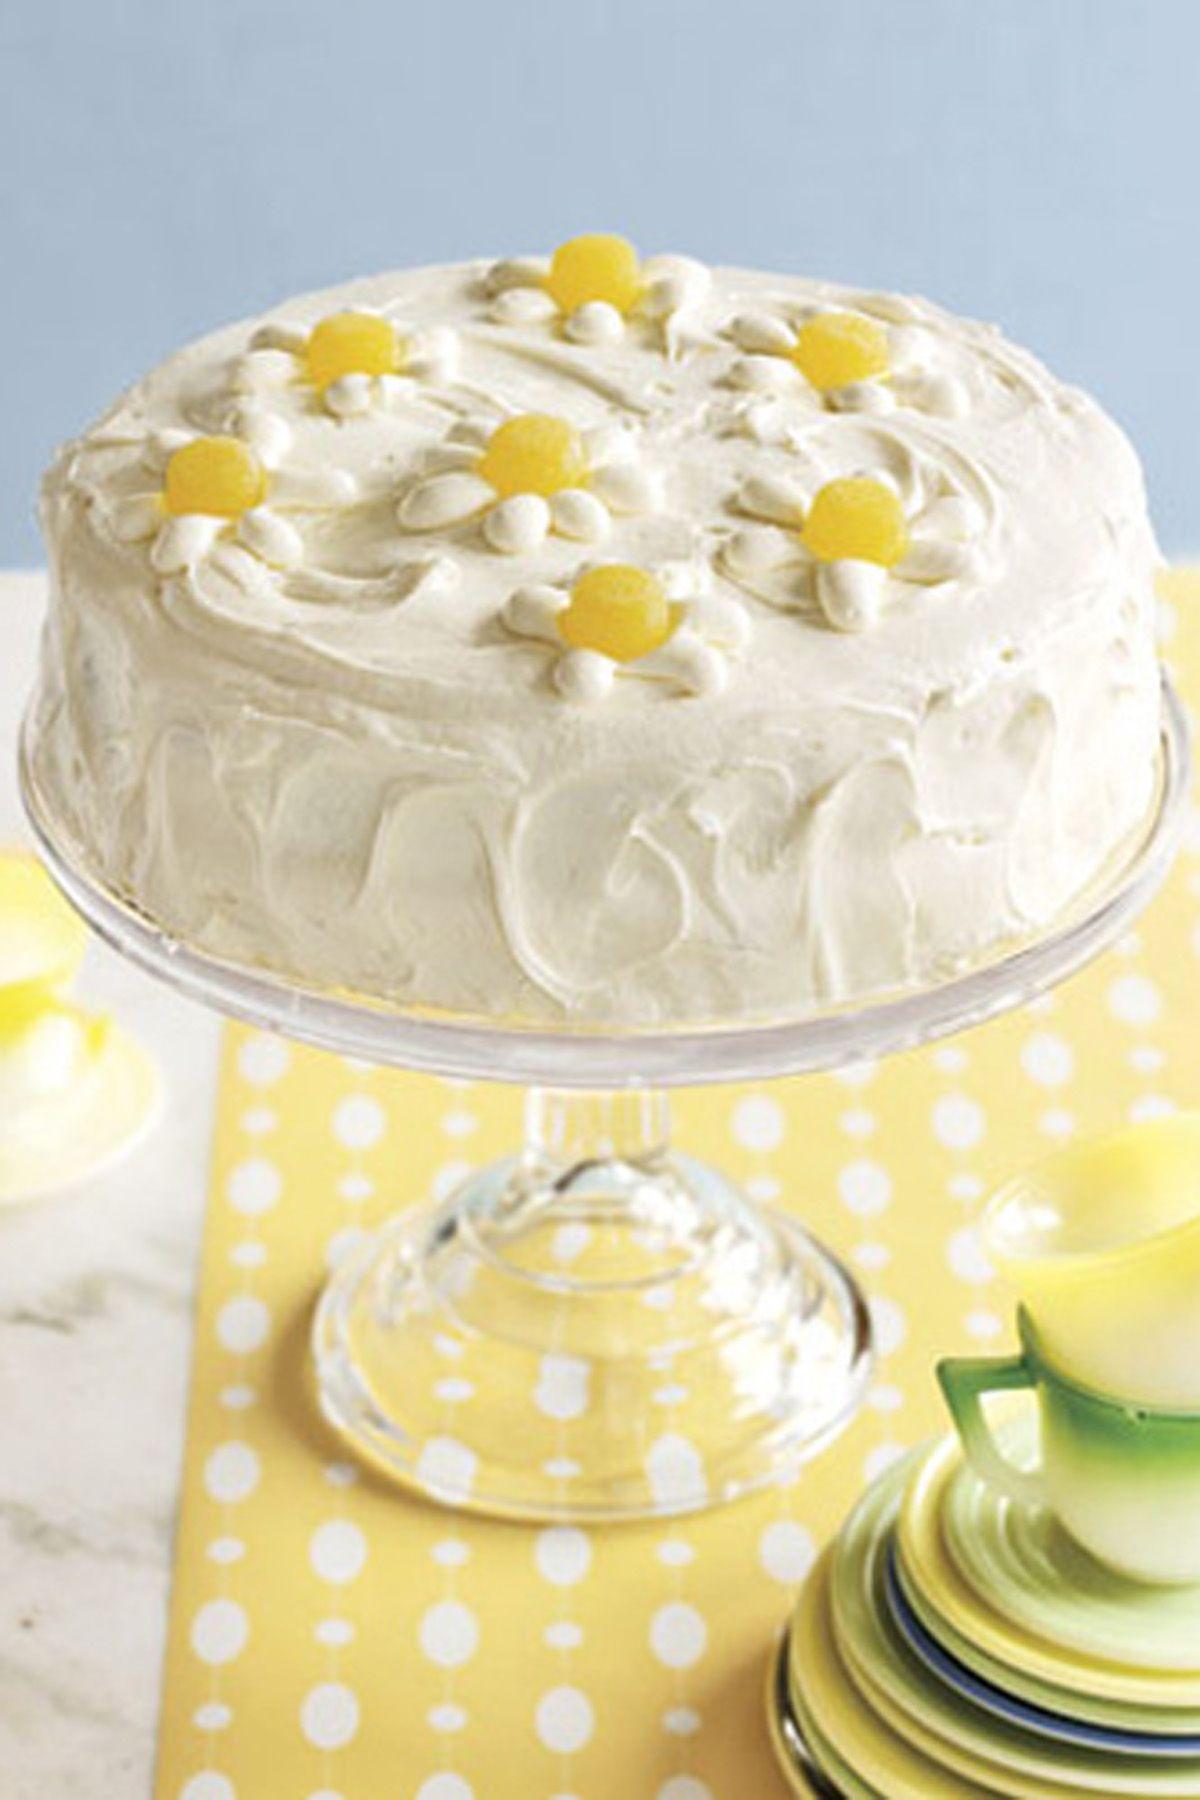 65 Best Homemade Cake Recipes - How to Make an Easy Cake